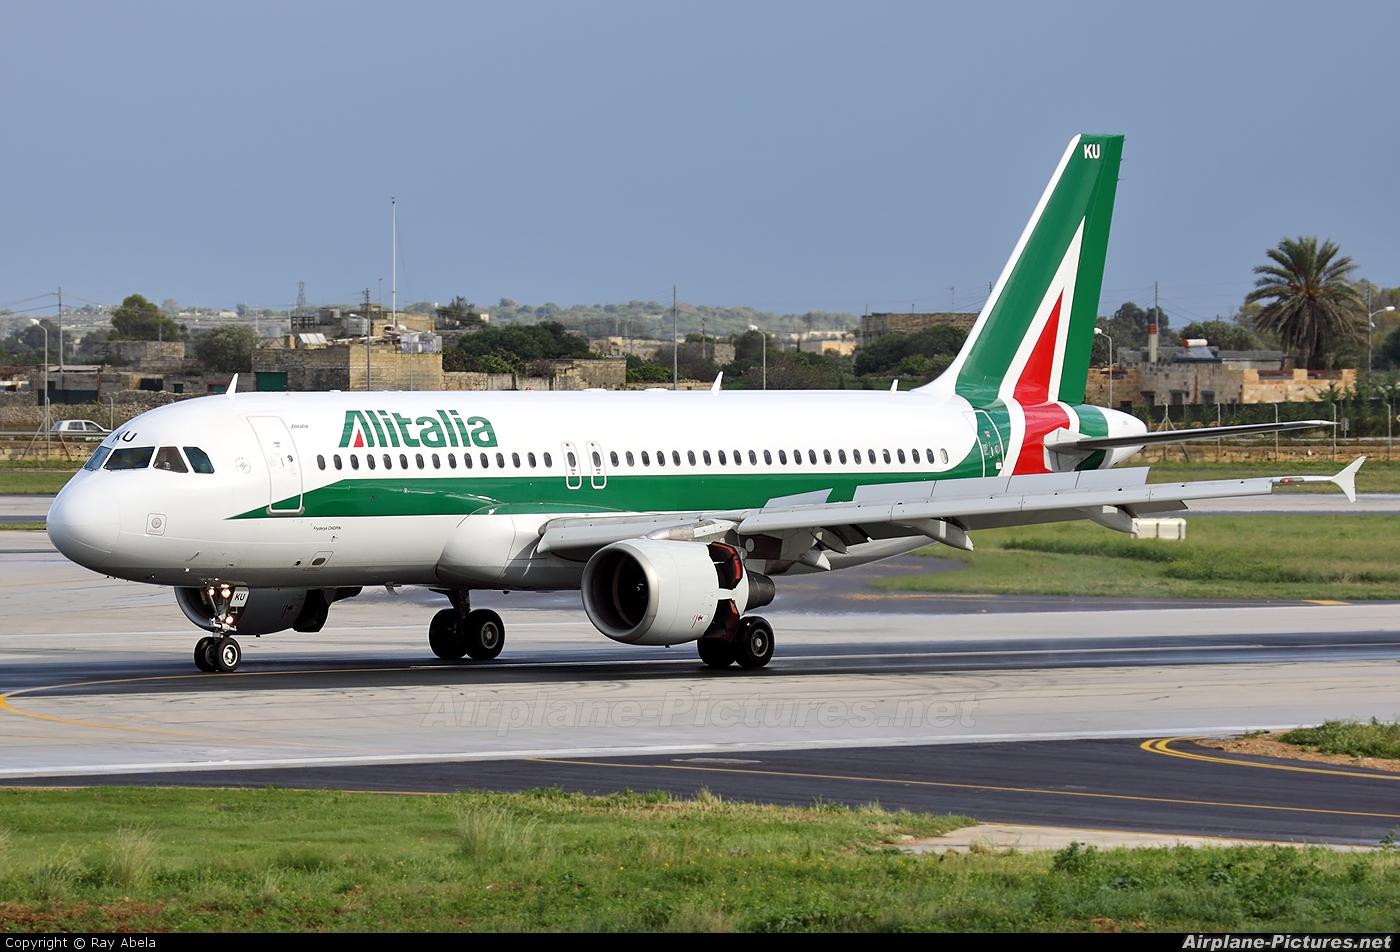 Jet Privato Alitalia : Ei iku alitalia airbus a at malta intl photo id